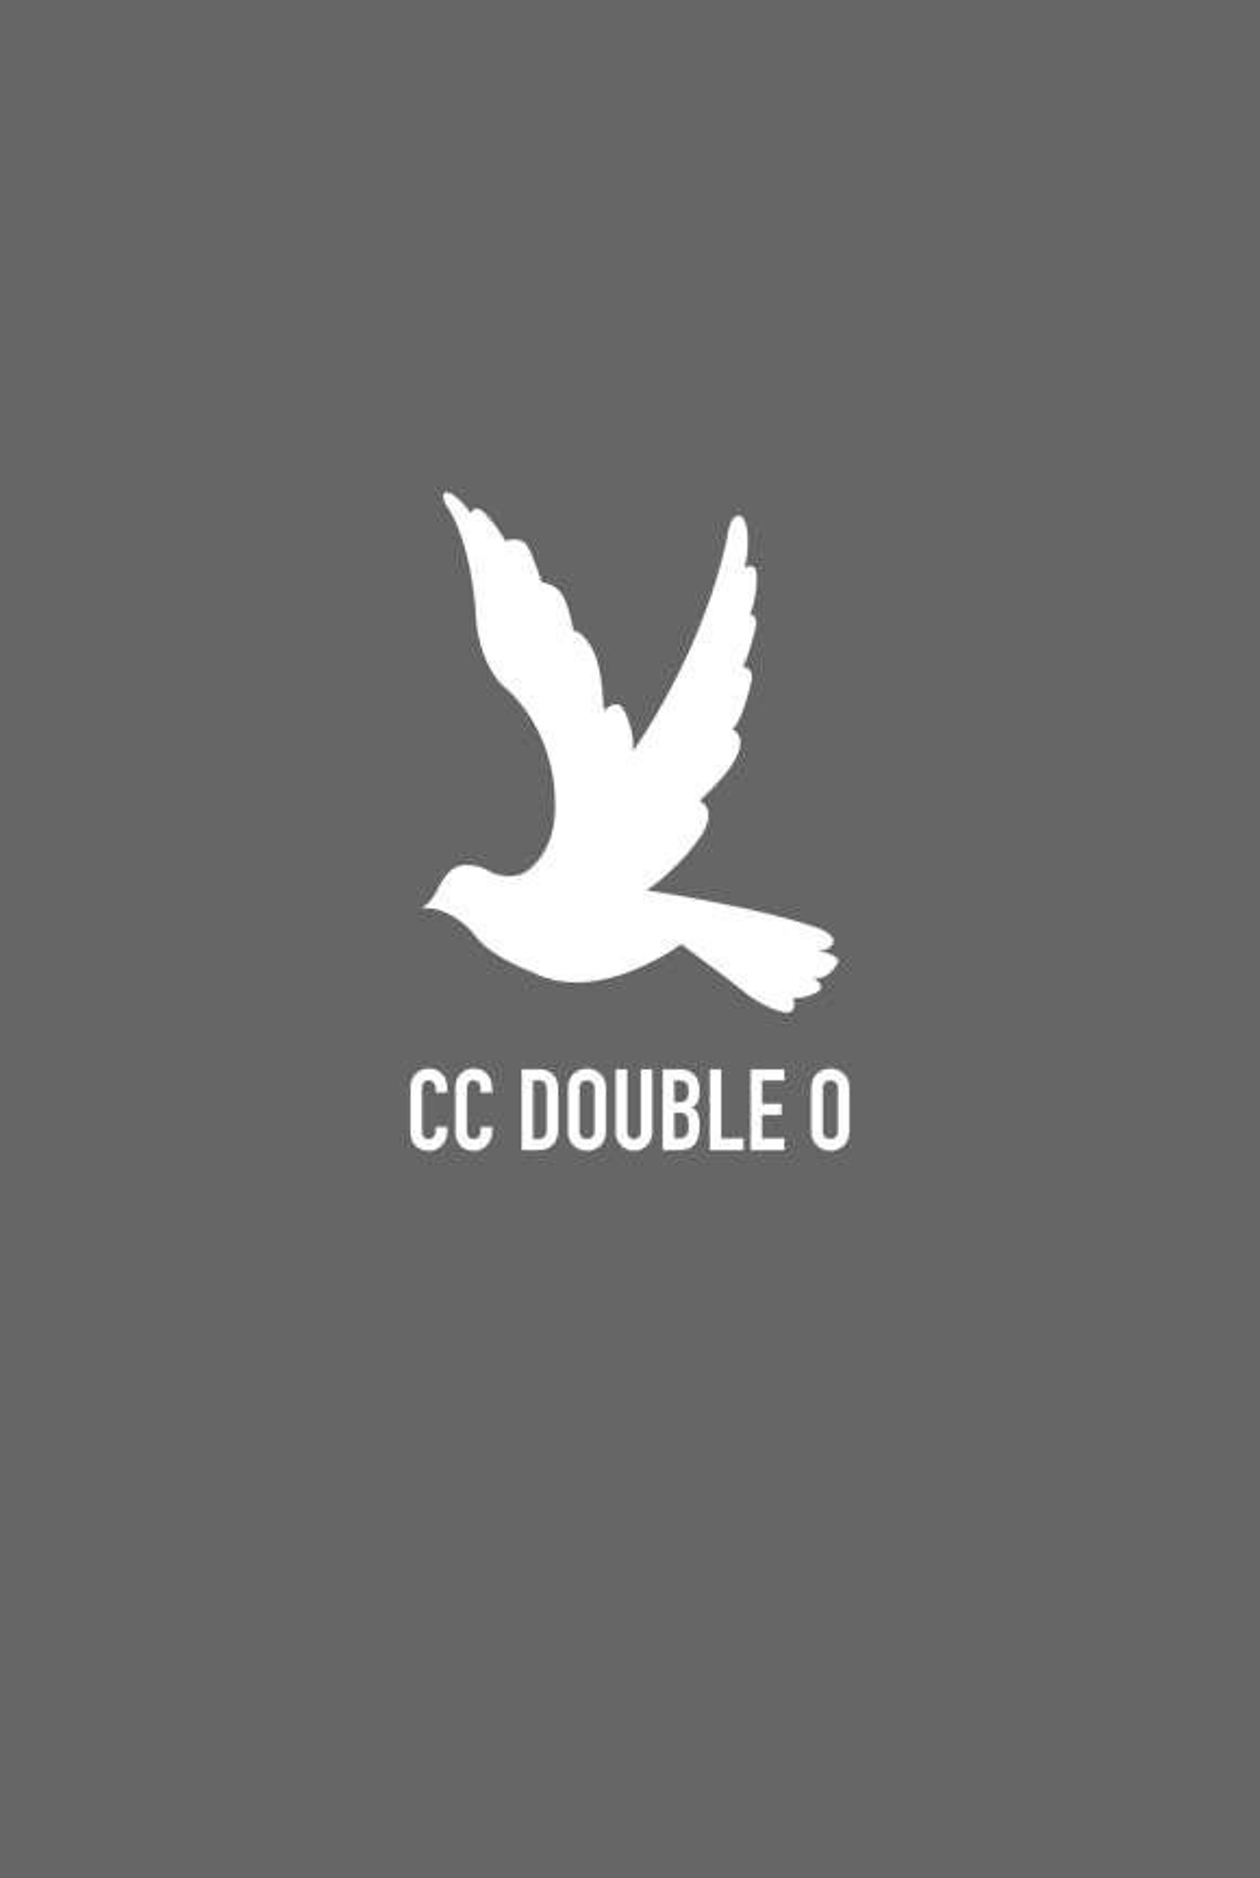 CC DOUBLE O Single-Strap Sandals